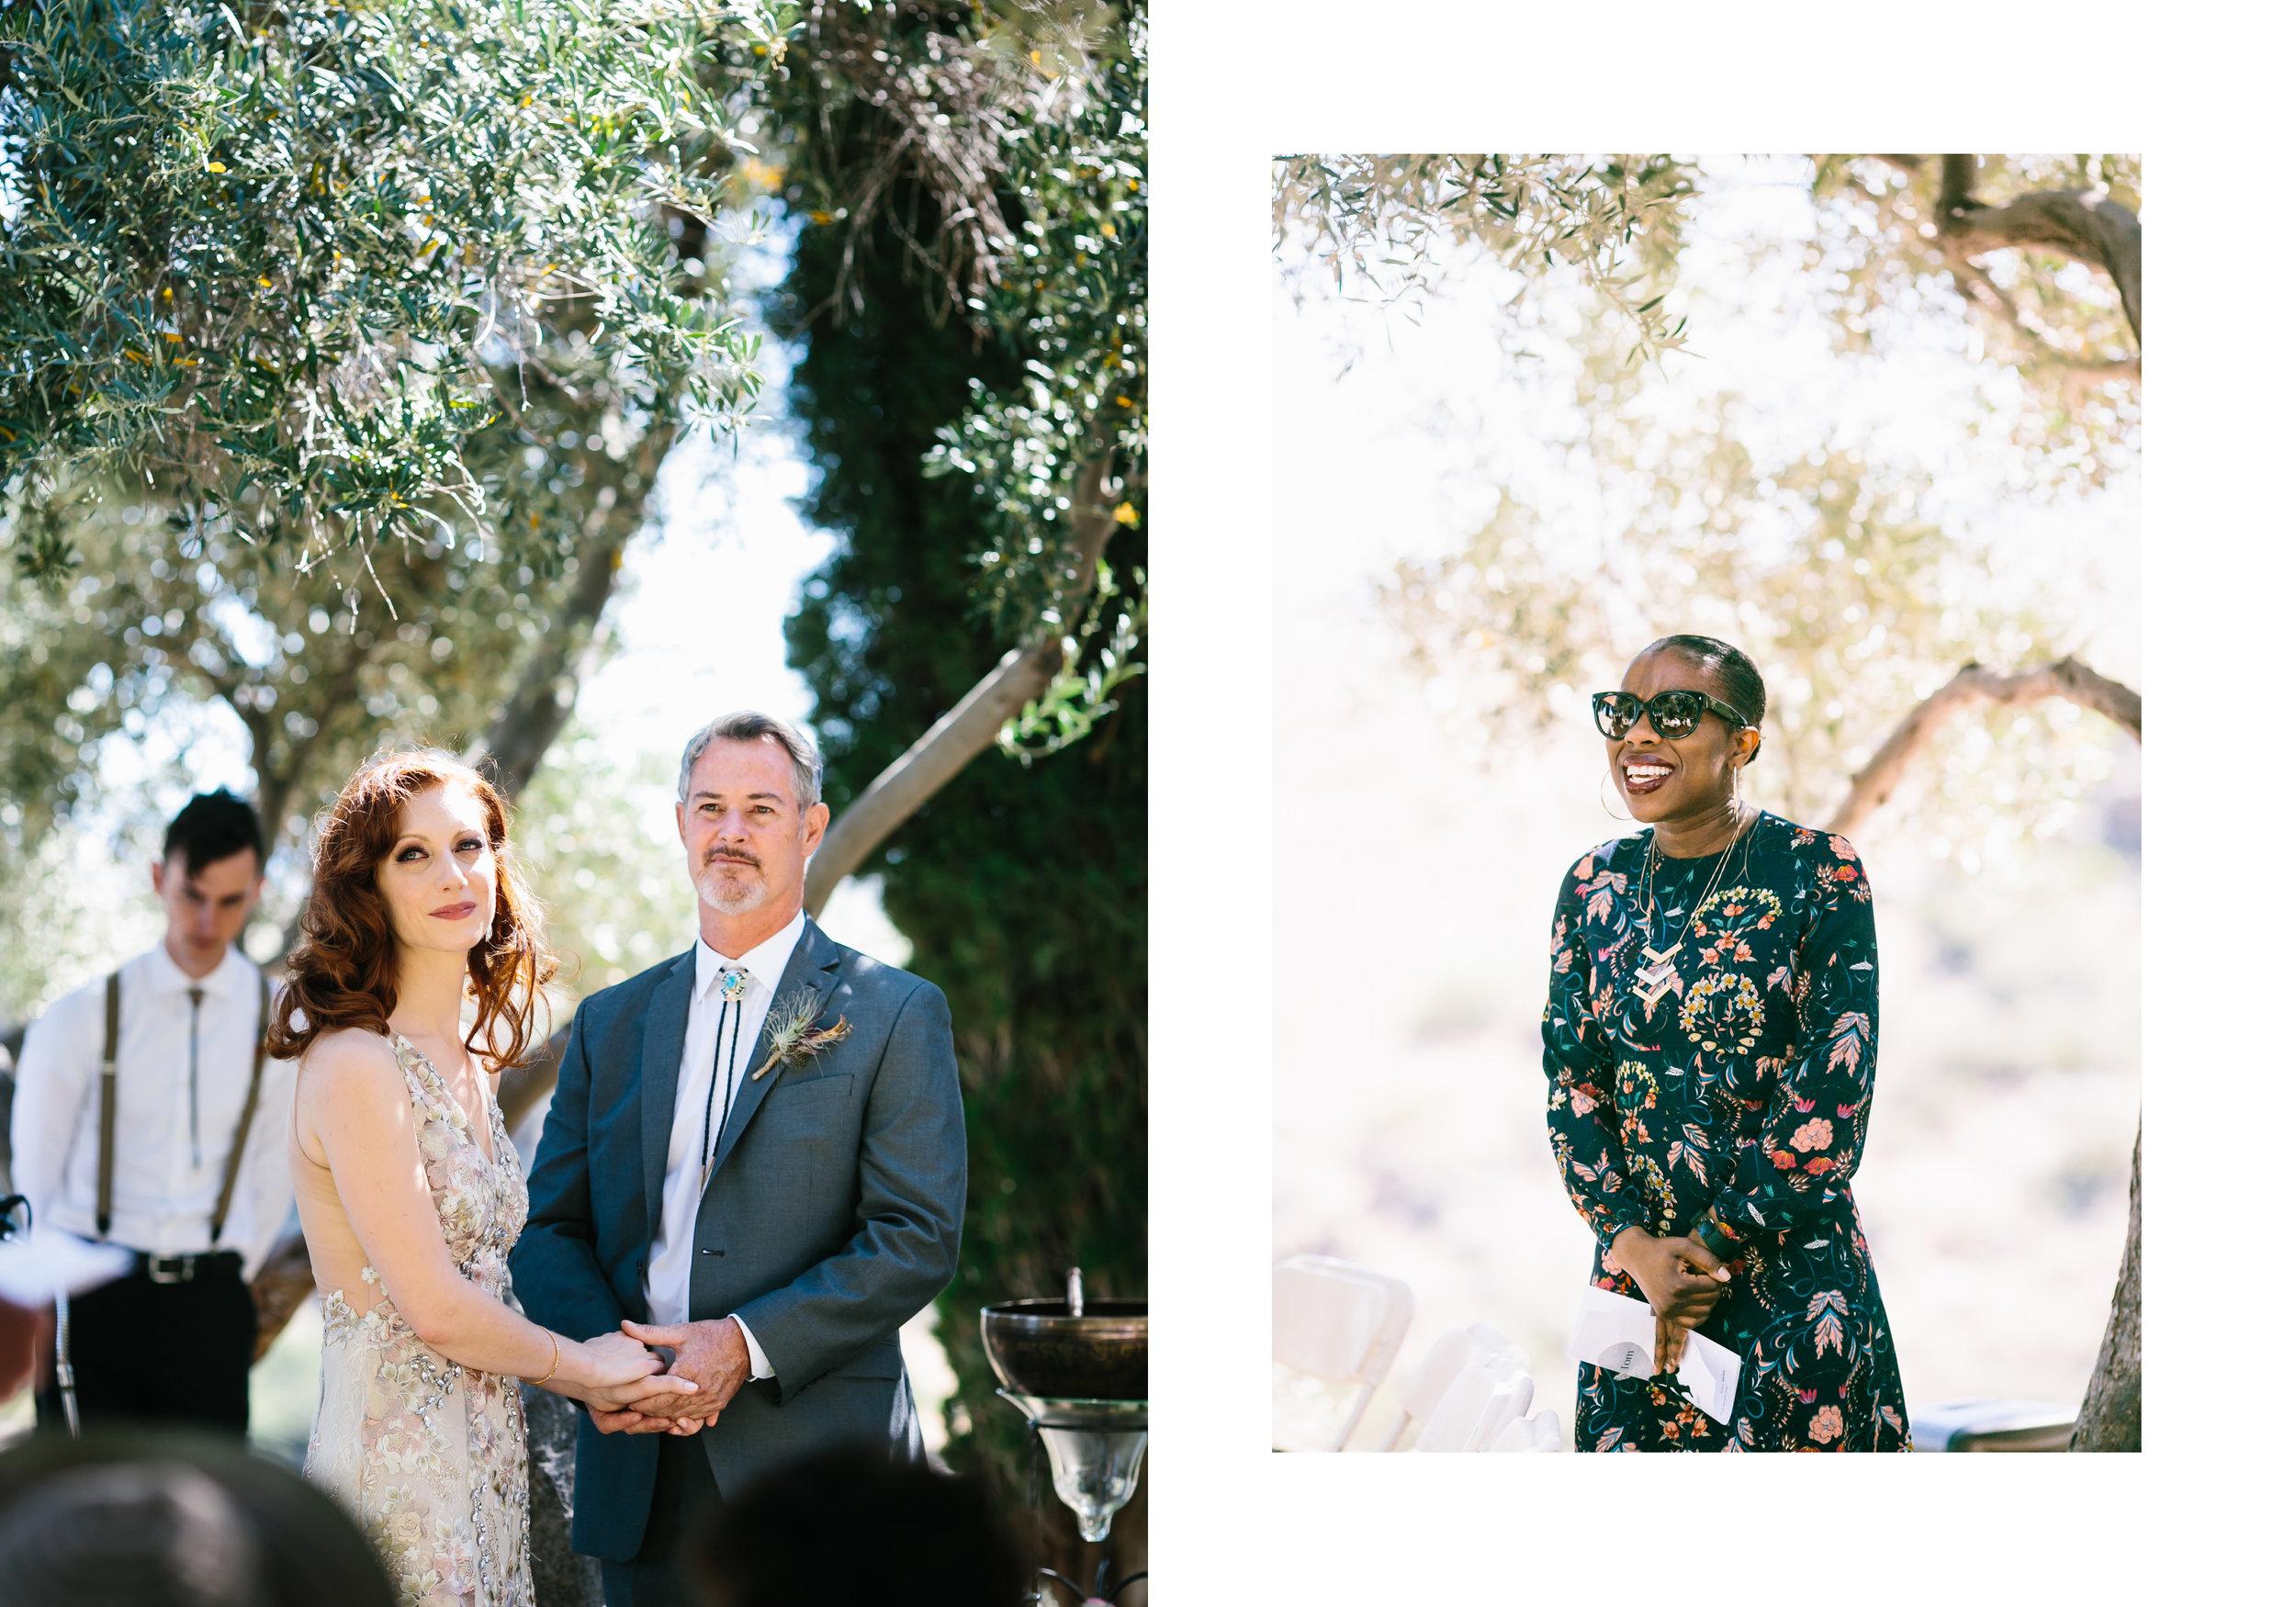 arcosanti-wedding-photography0020.JPG